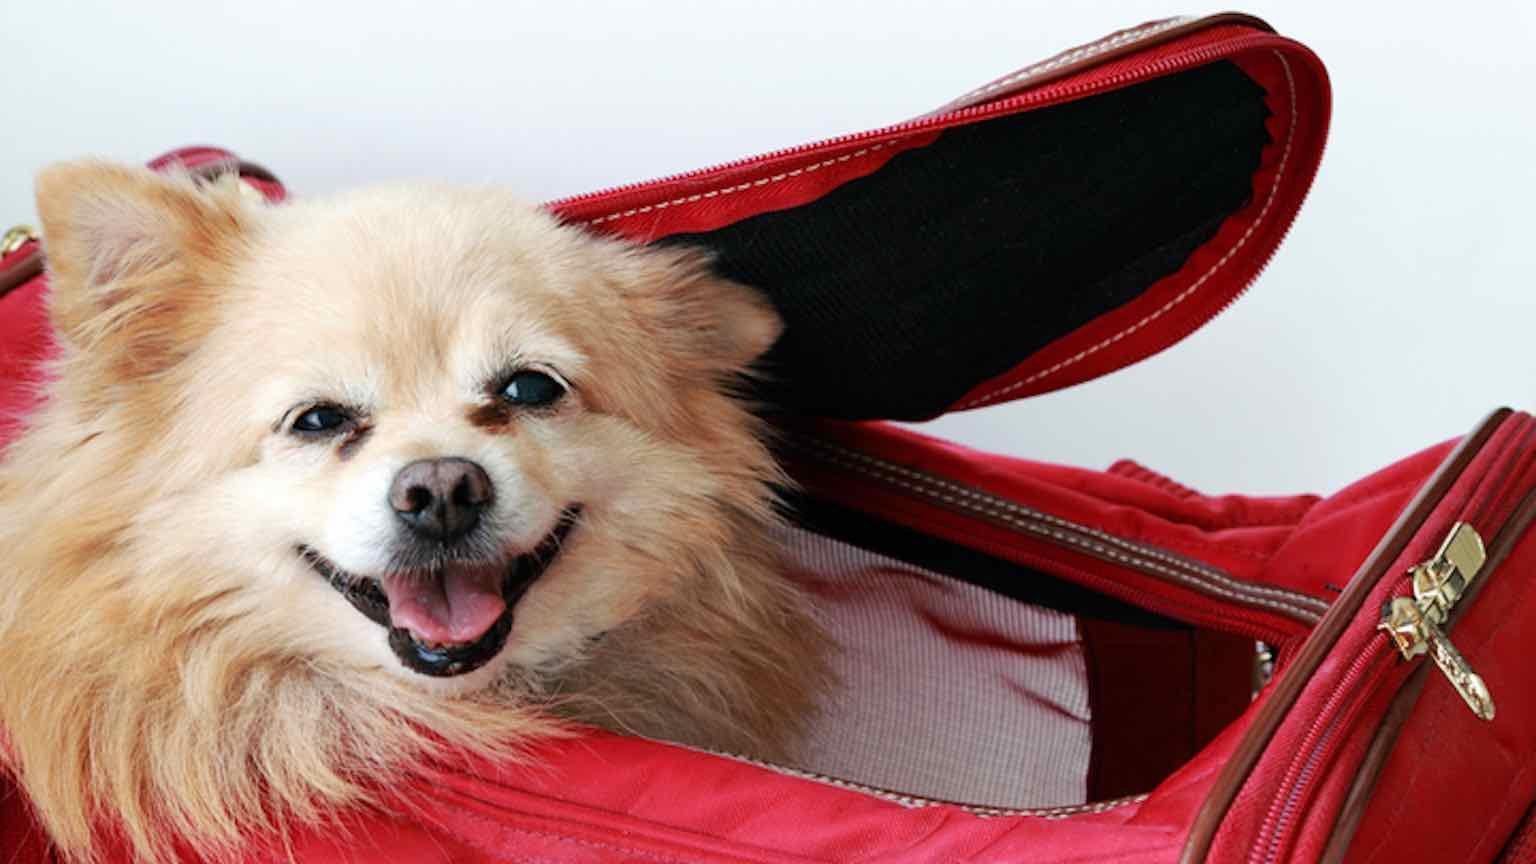 Cute dog in a pet carrier